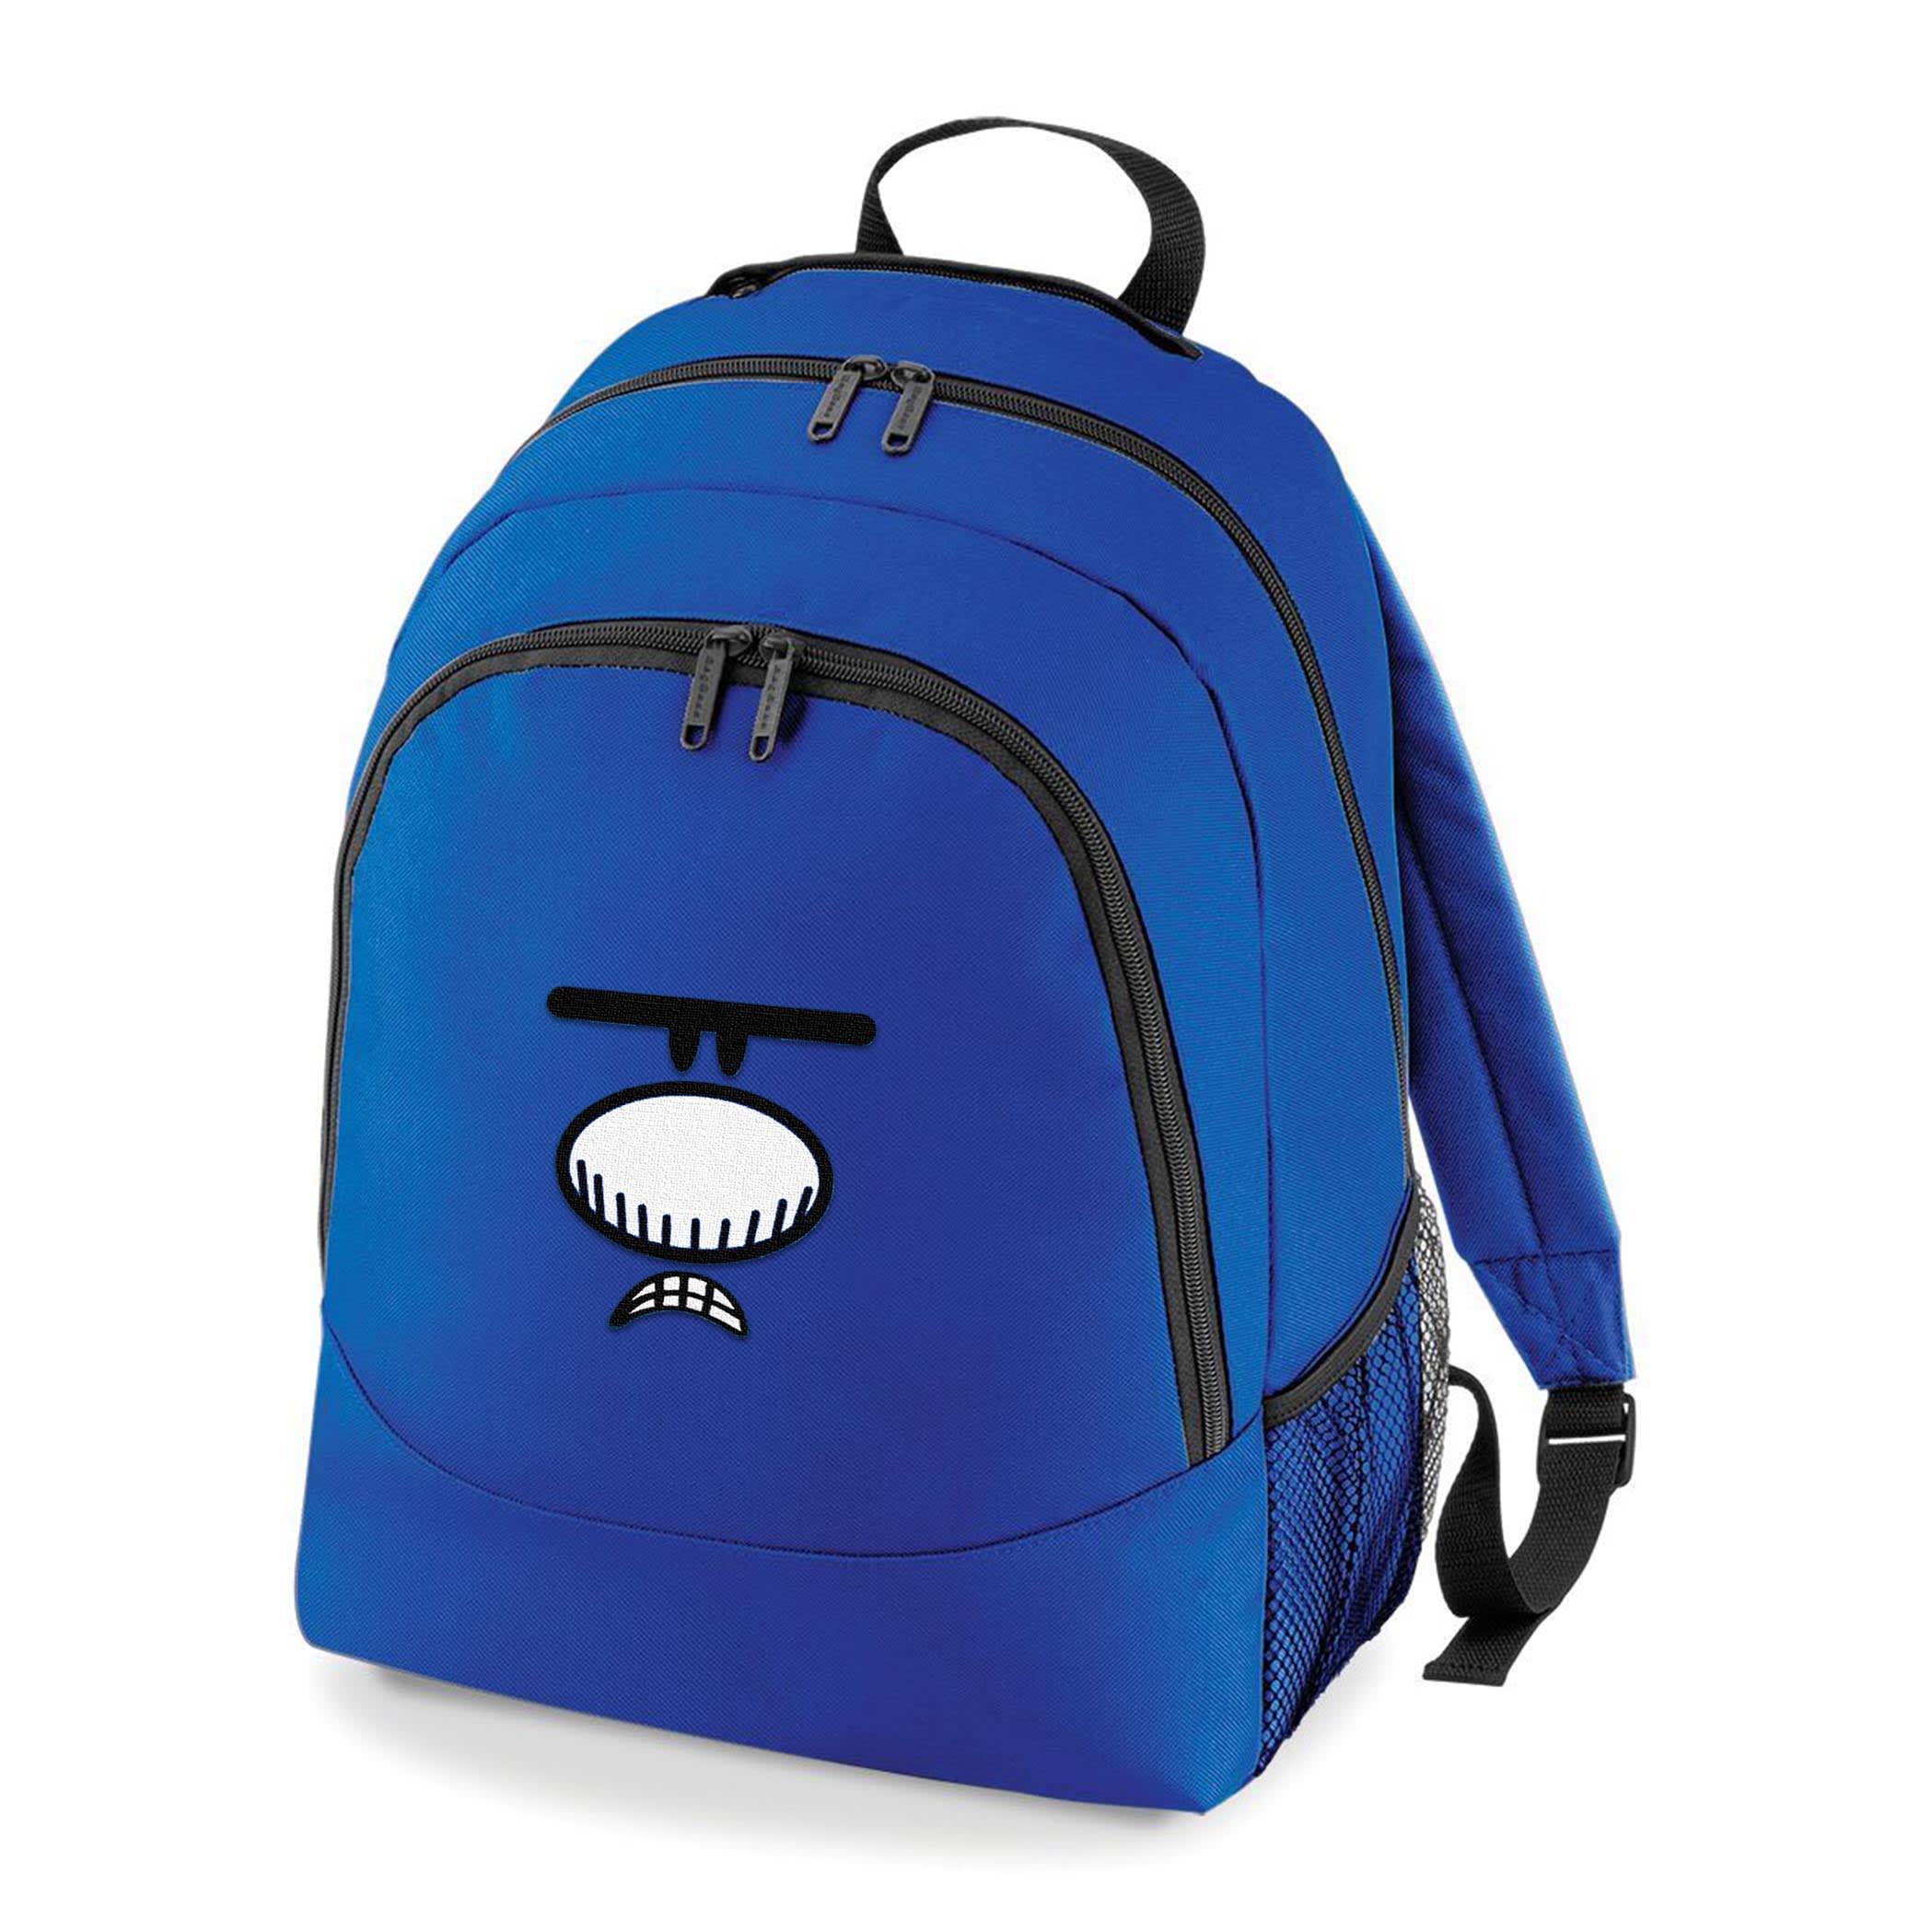 Mr Grumpy Rucksack Bag